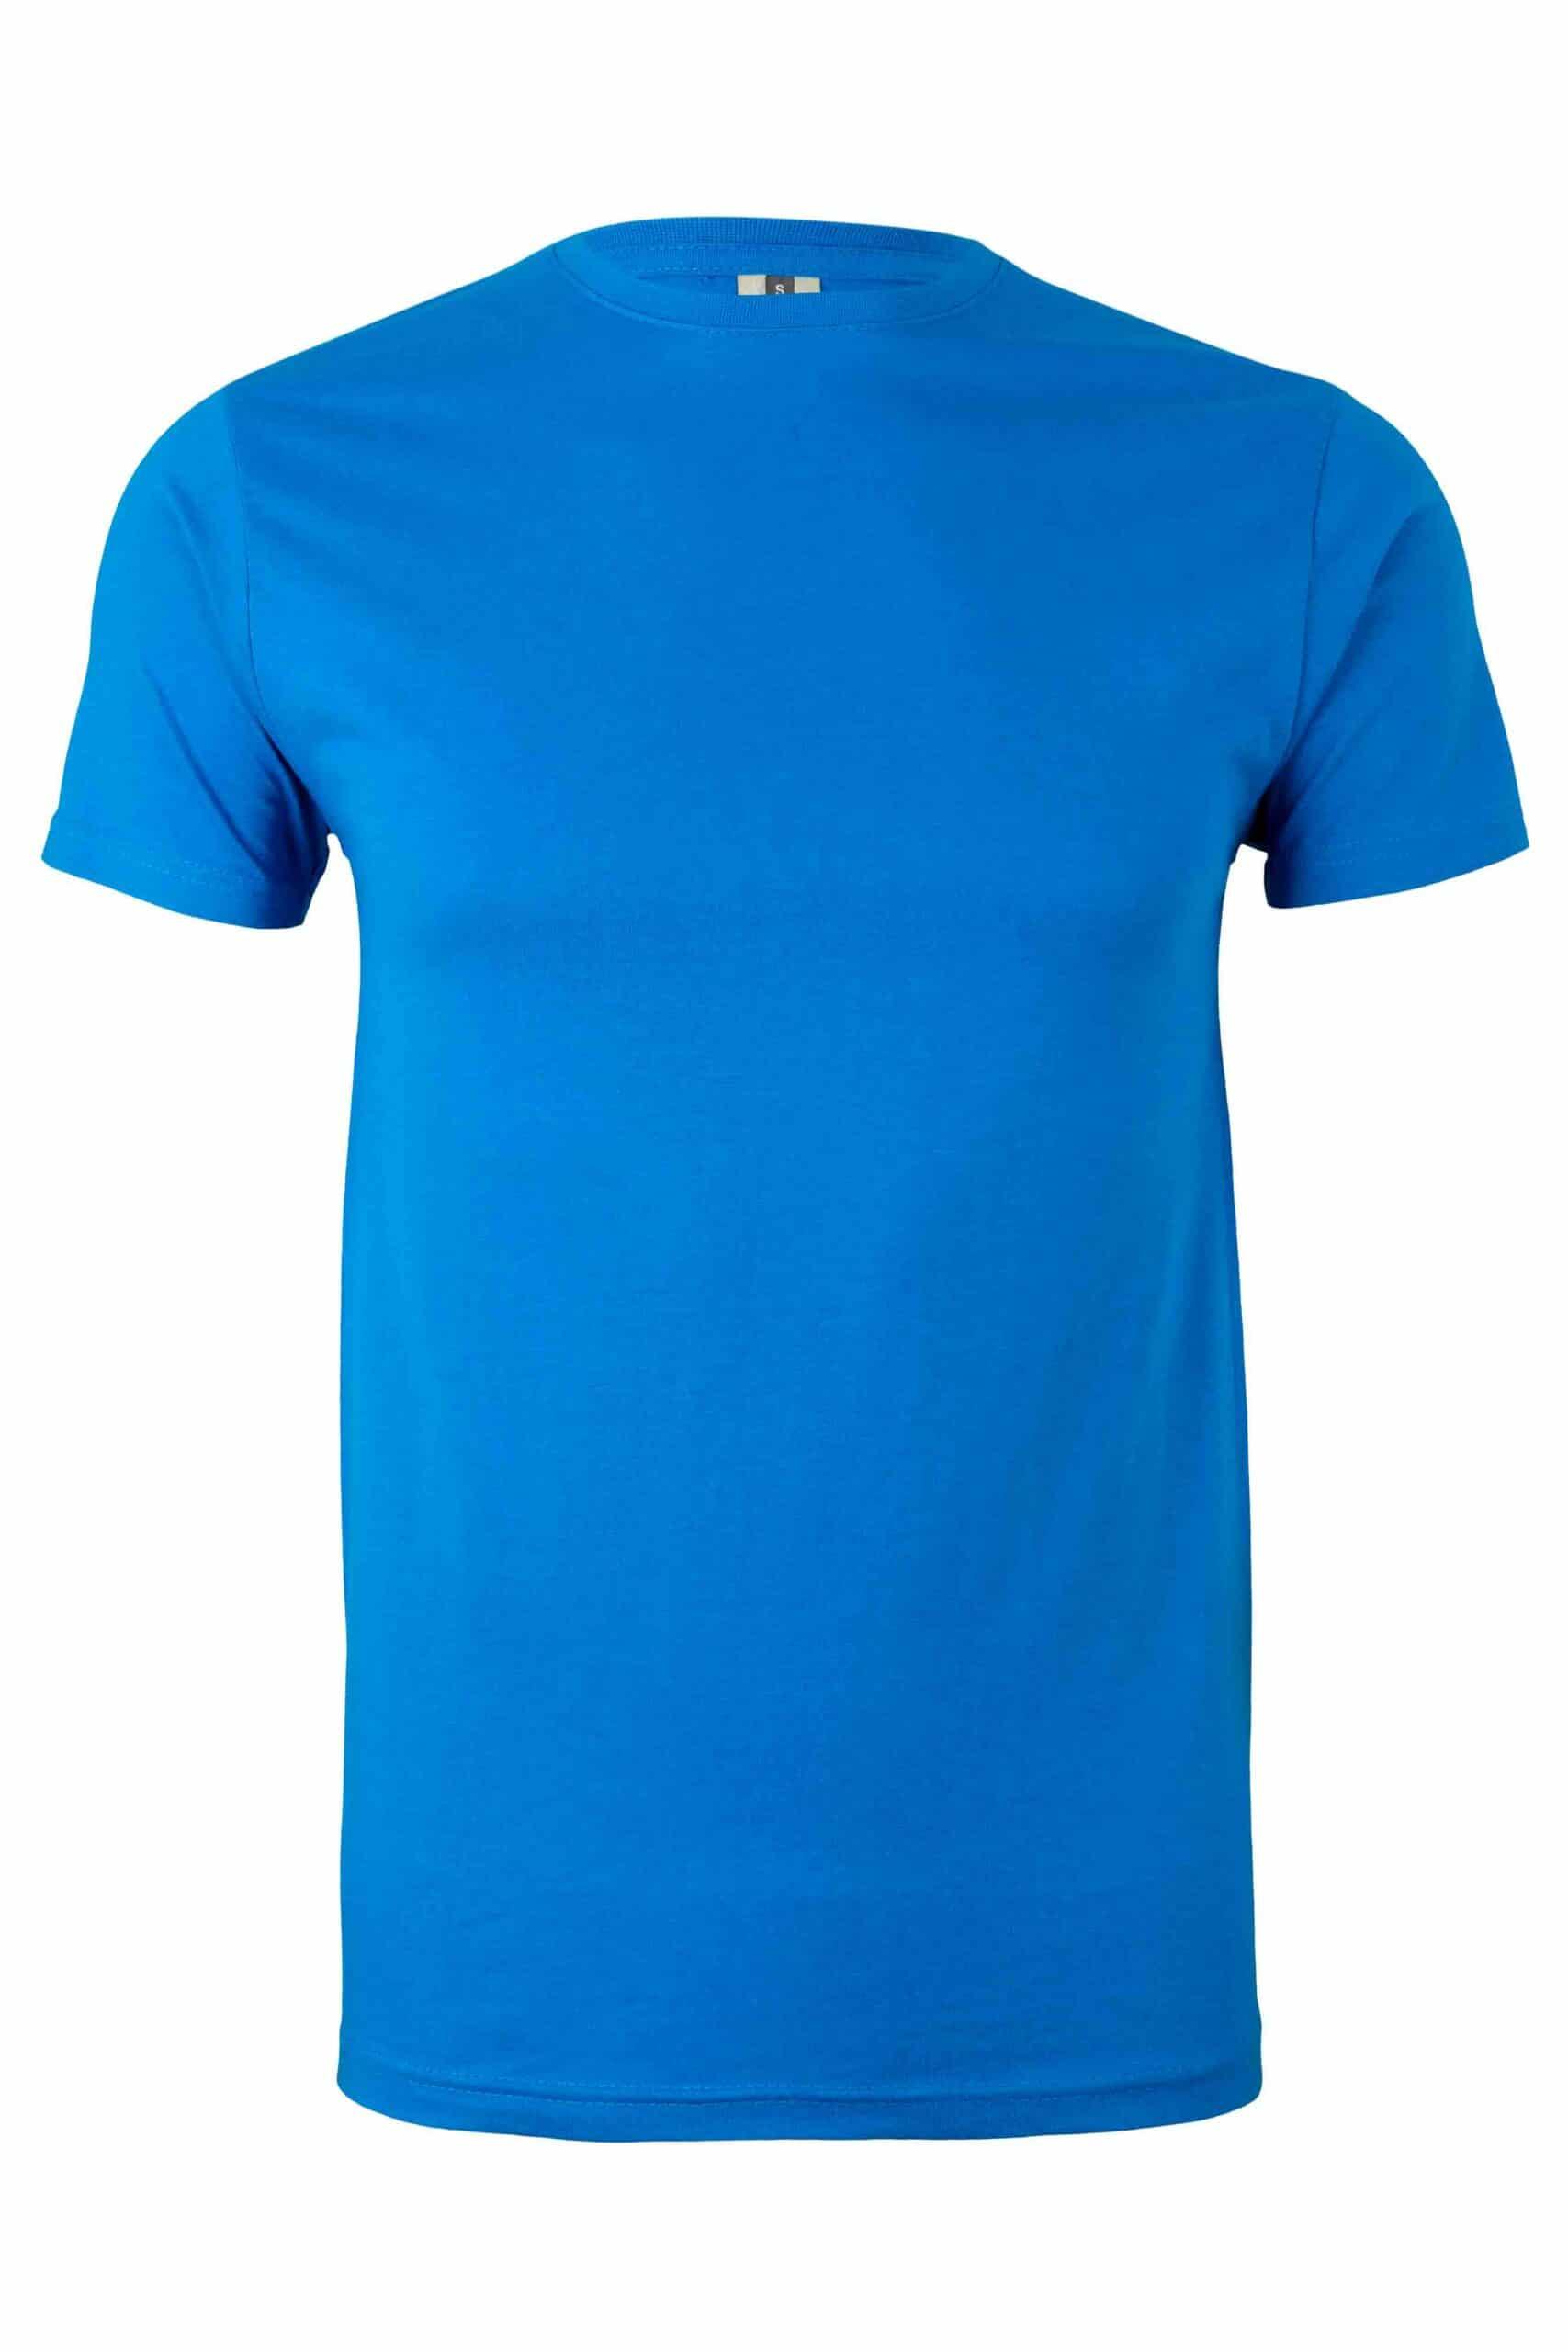 Mukua Mk023cv Camiseta Manga Corta Color 190gr Atoll